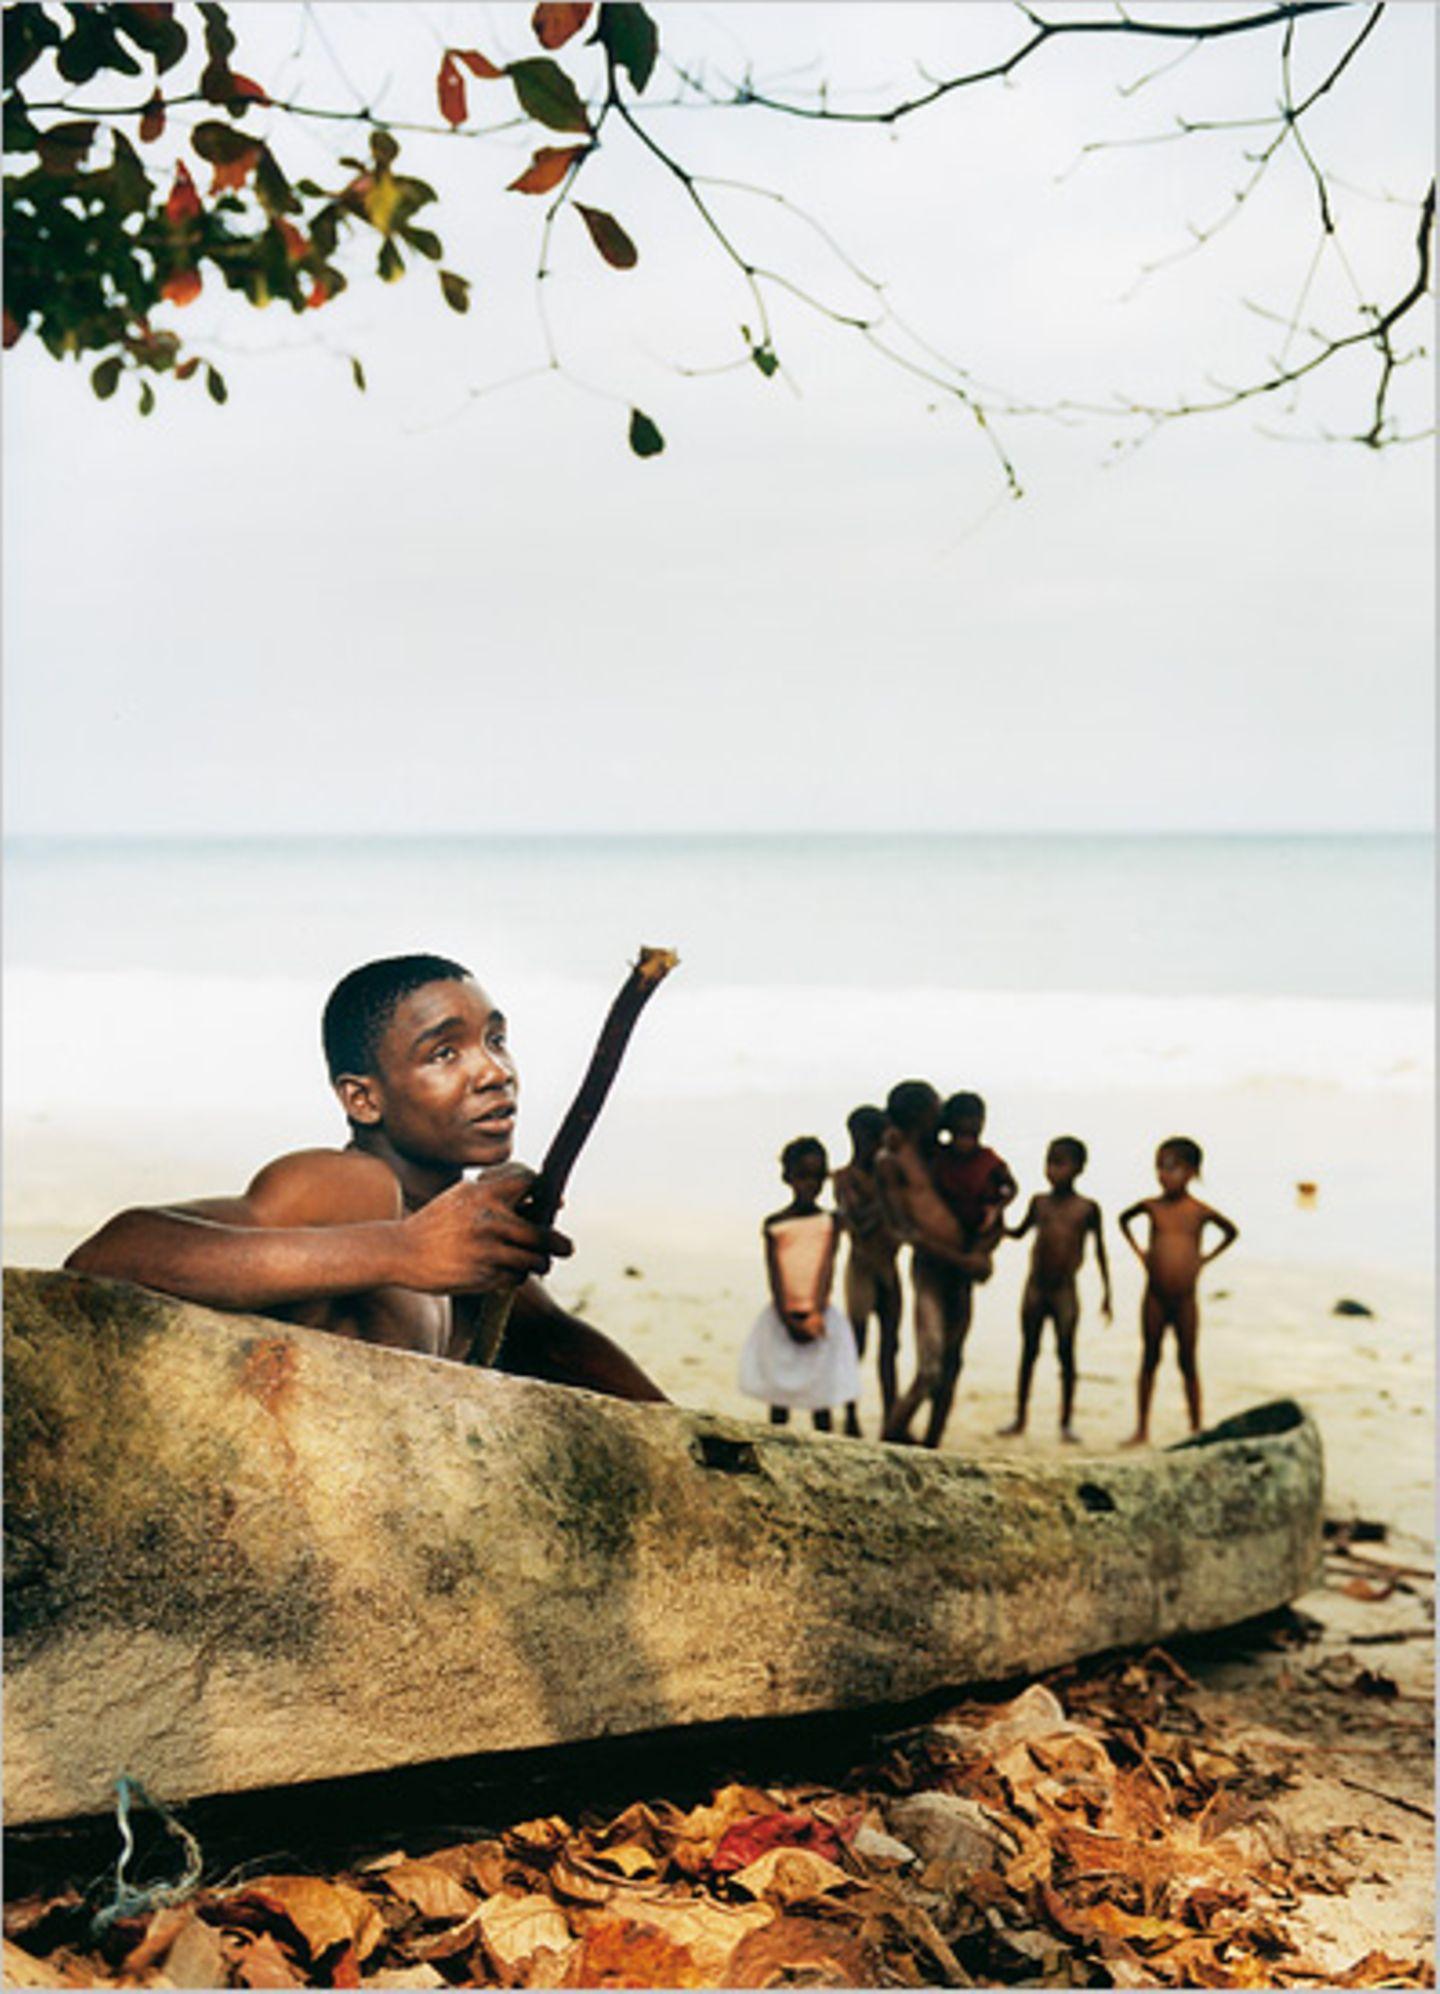 São Tomé & Príncipe: Inseln der Illusionen - Bild 3